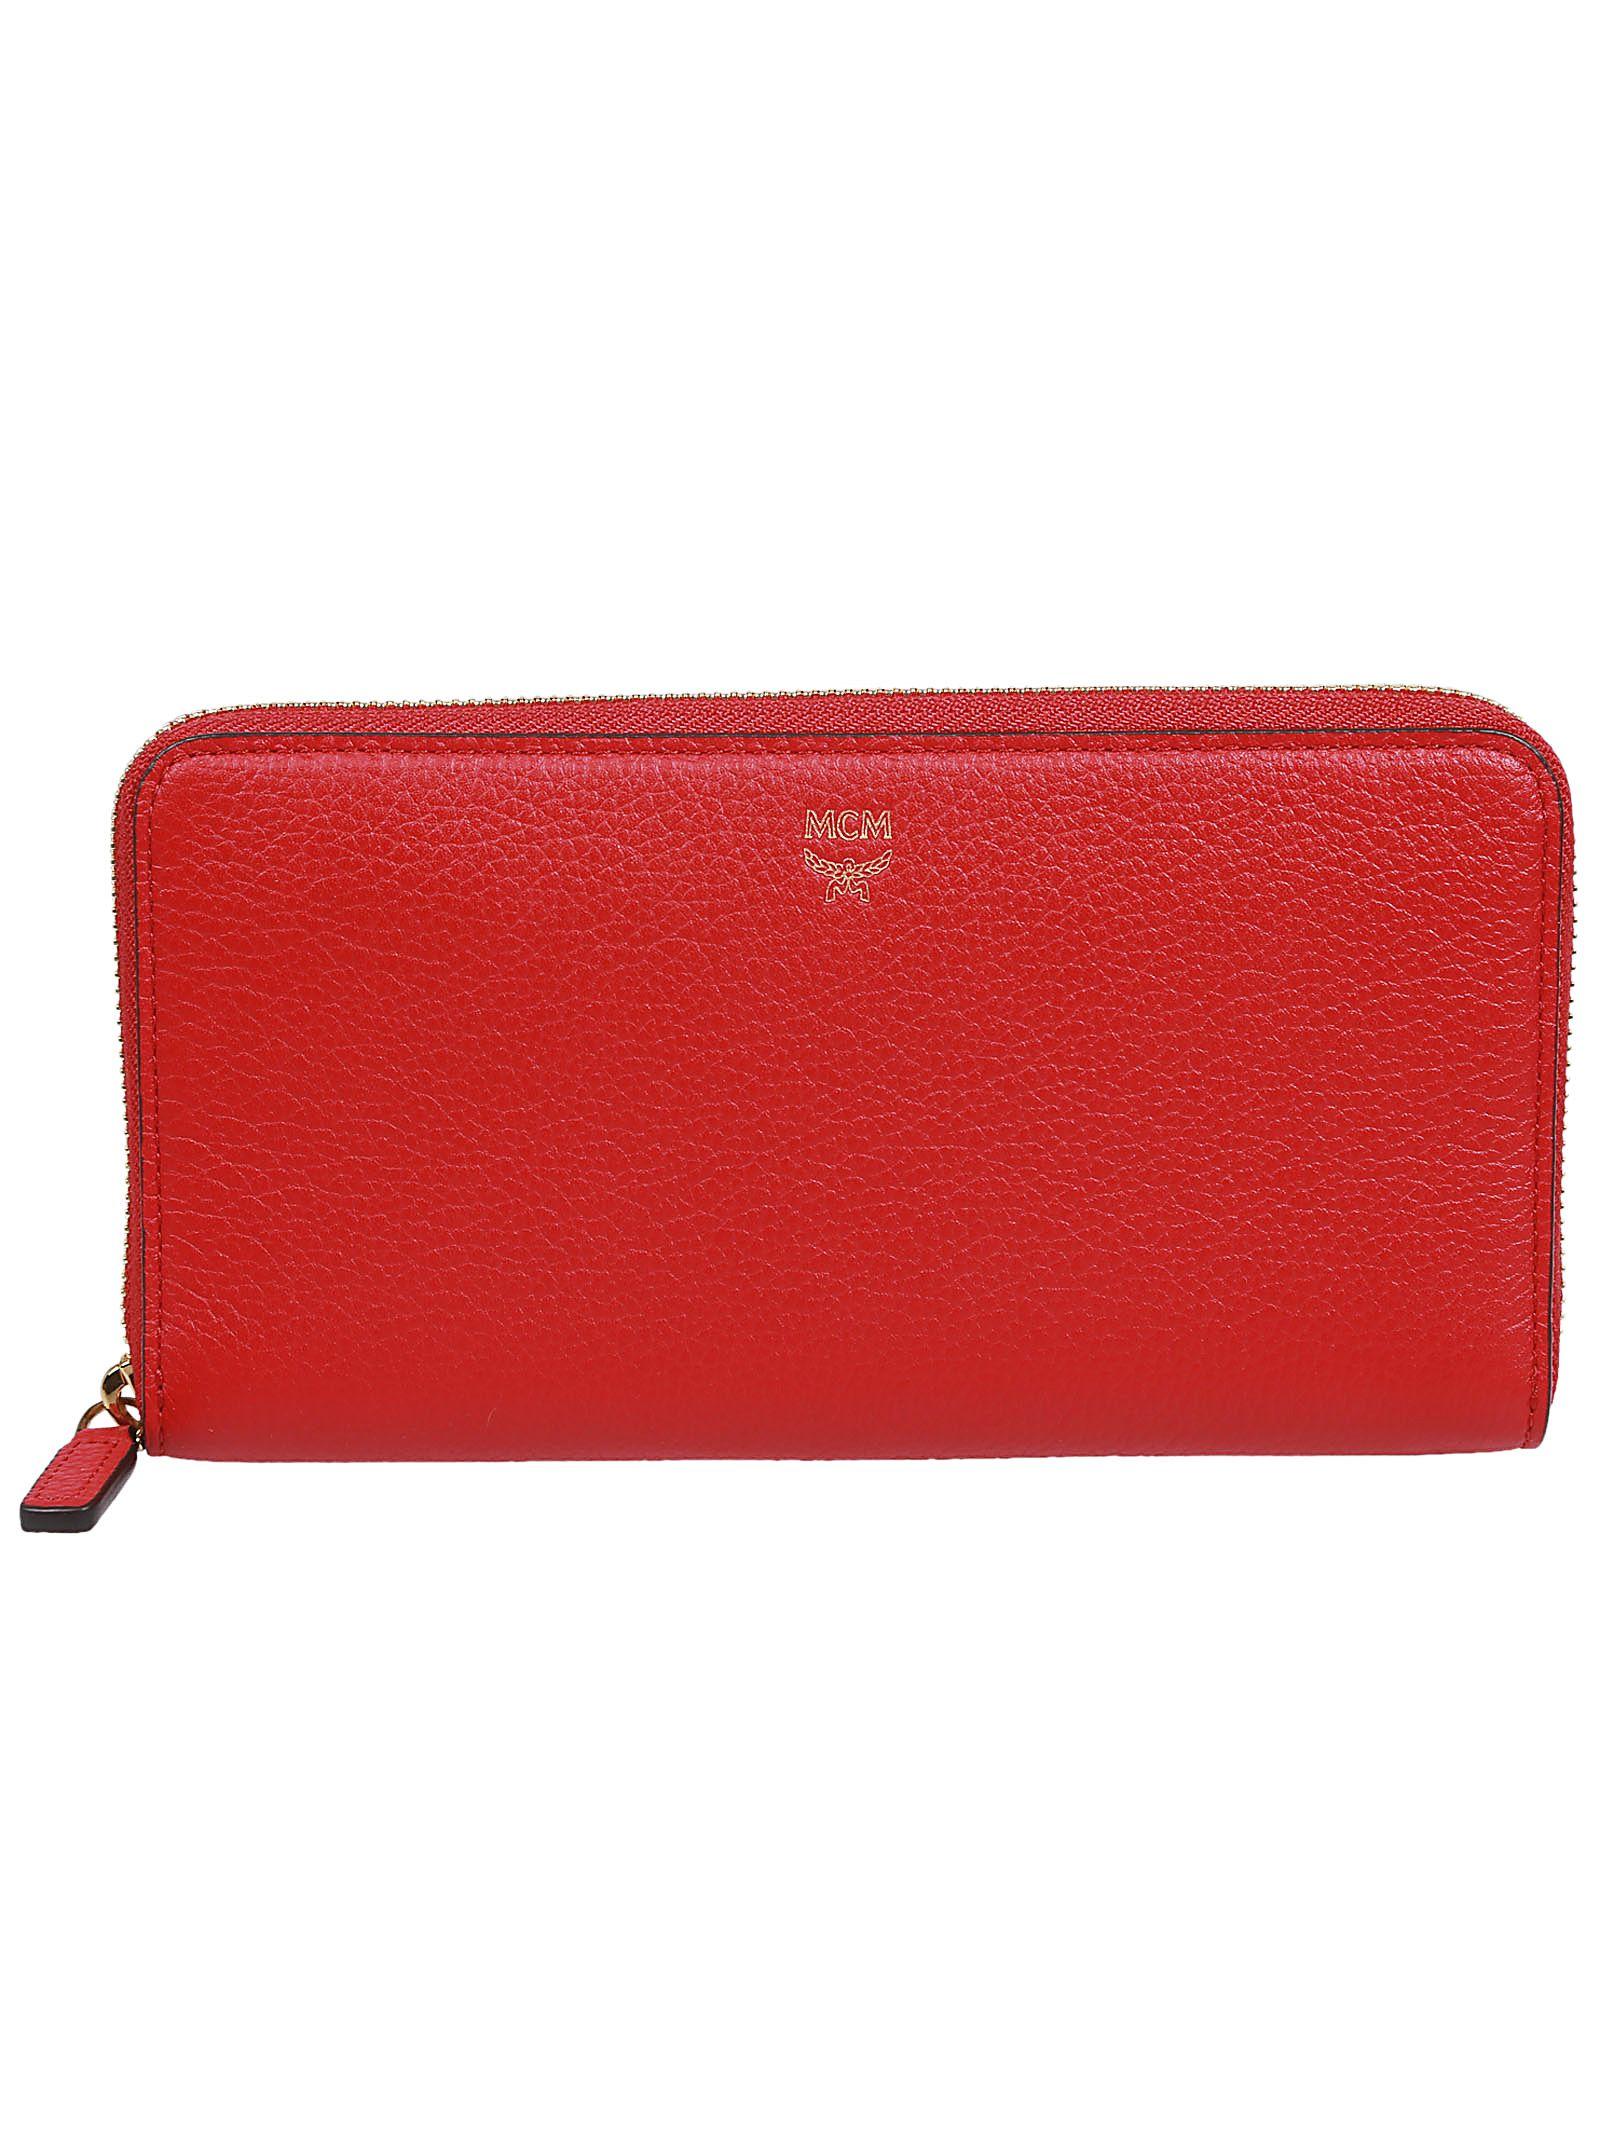 Mcm Milla Zip Around Wallet